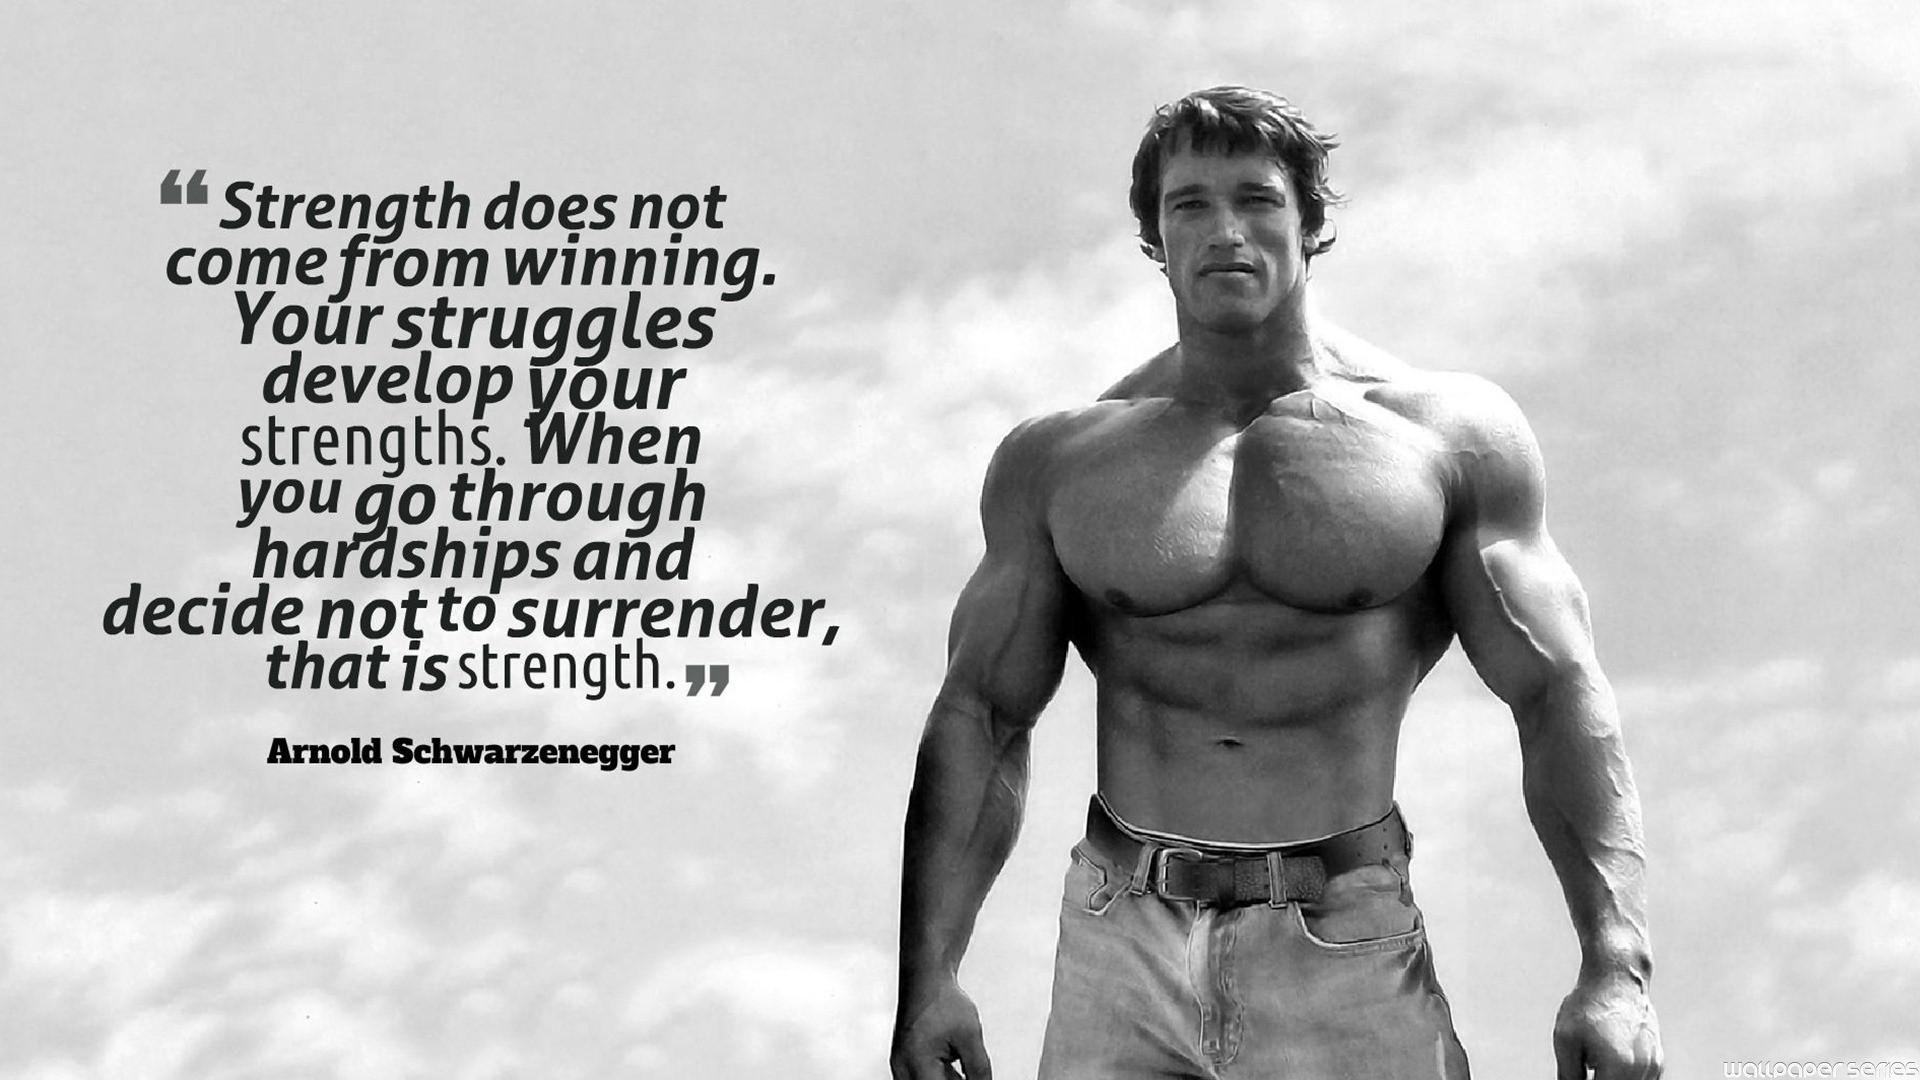 Wallpaper 1920x1080 Px Arnold Schwarzenegger